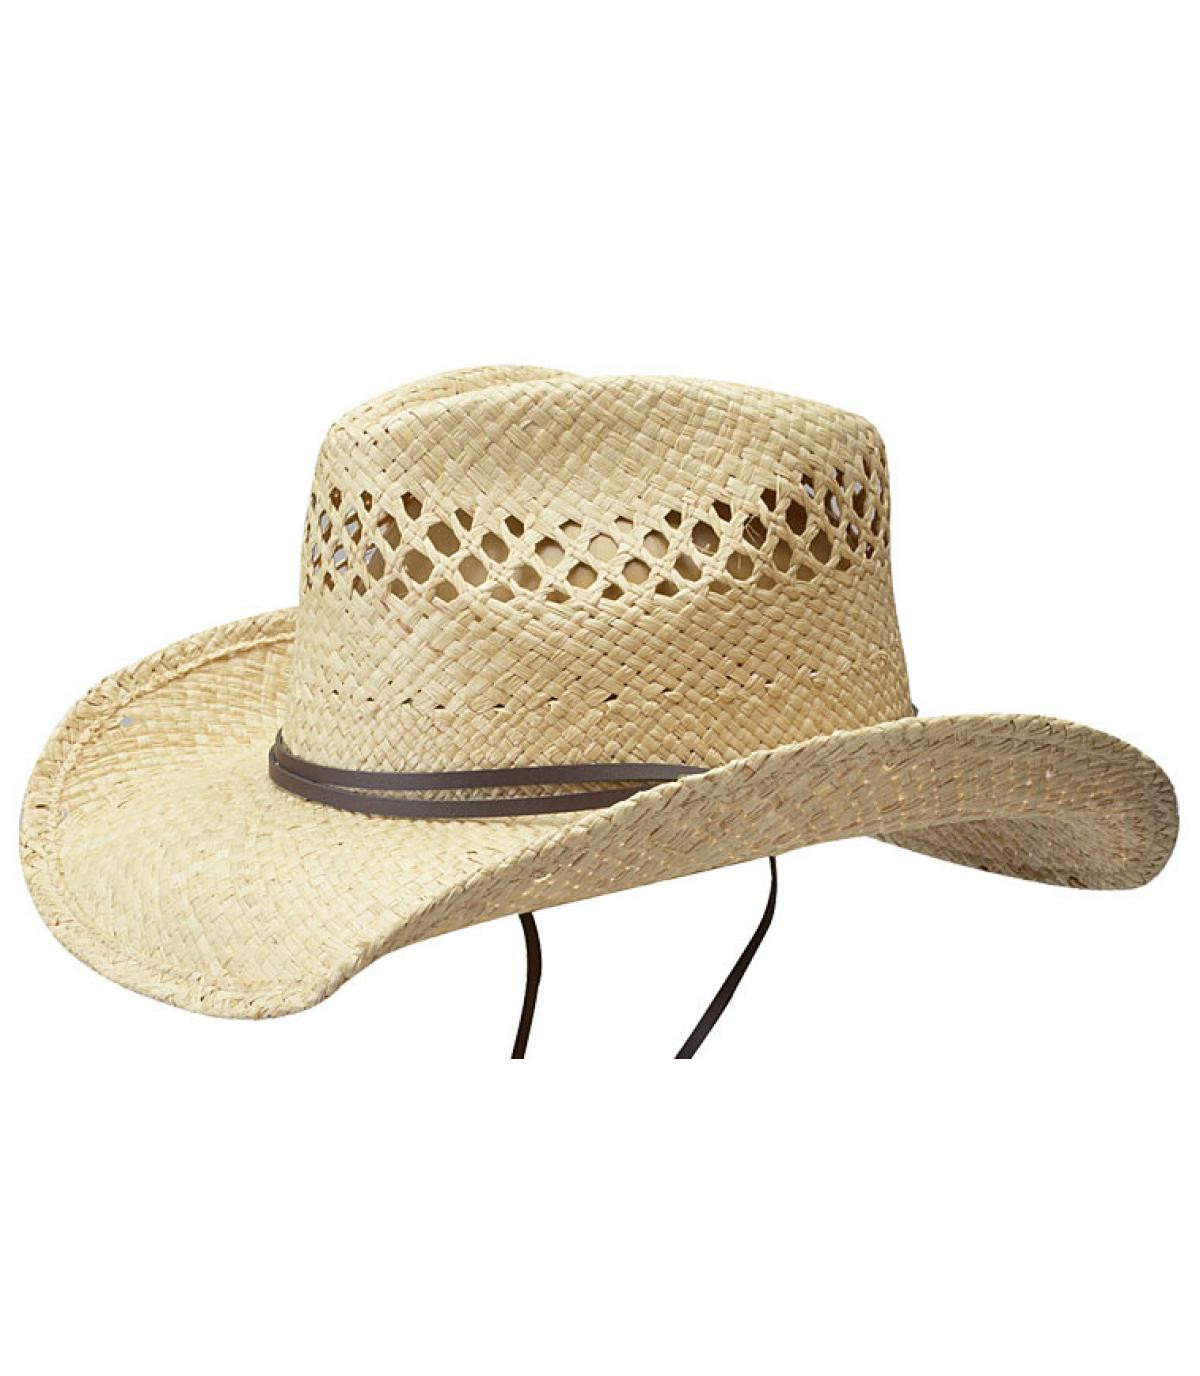 Stetson dames cowboy hoed